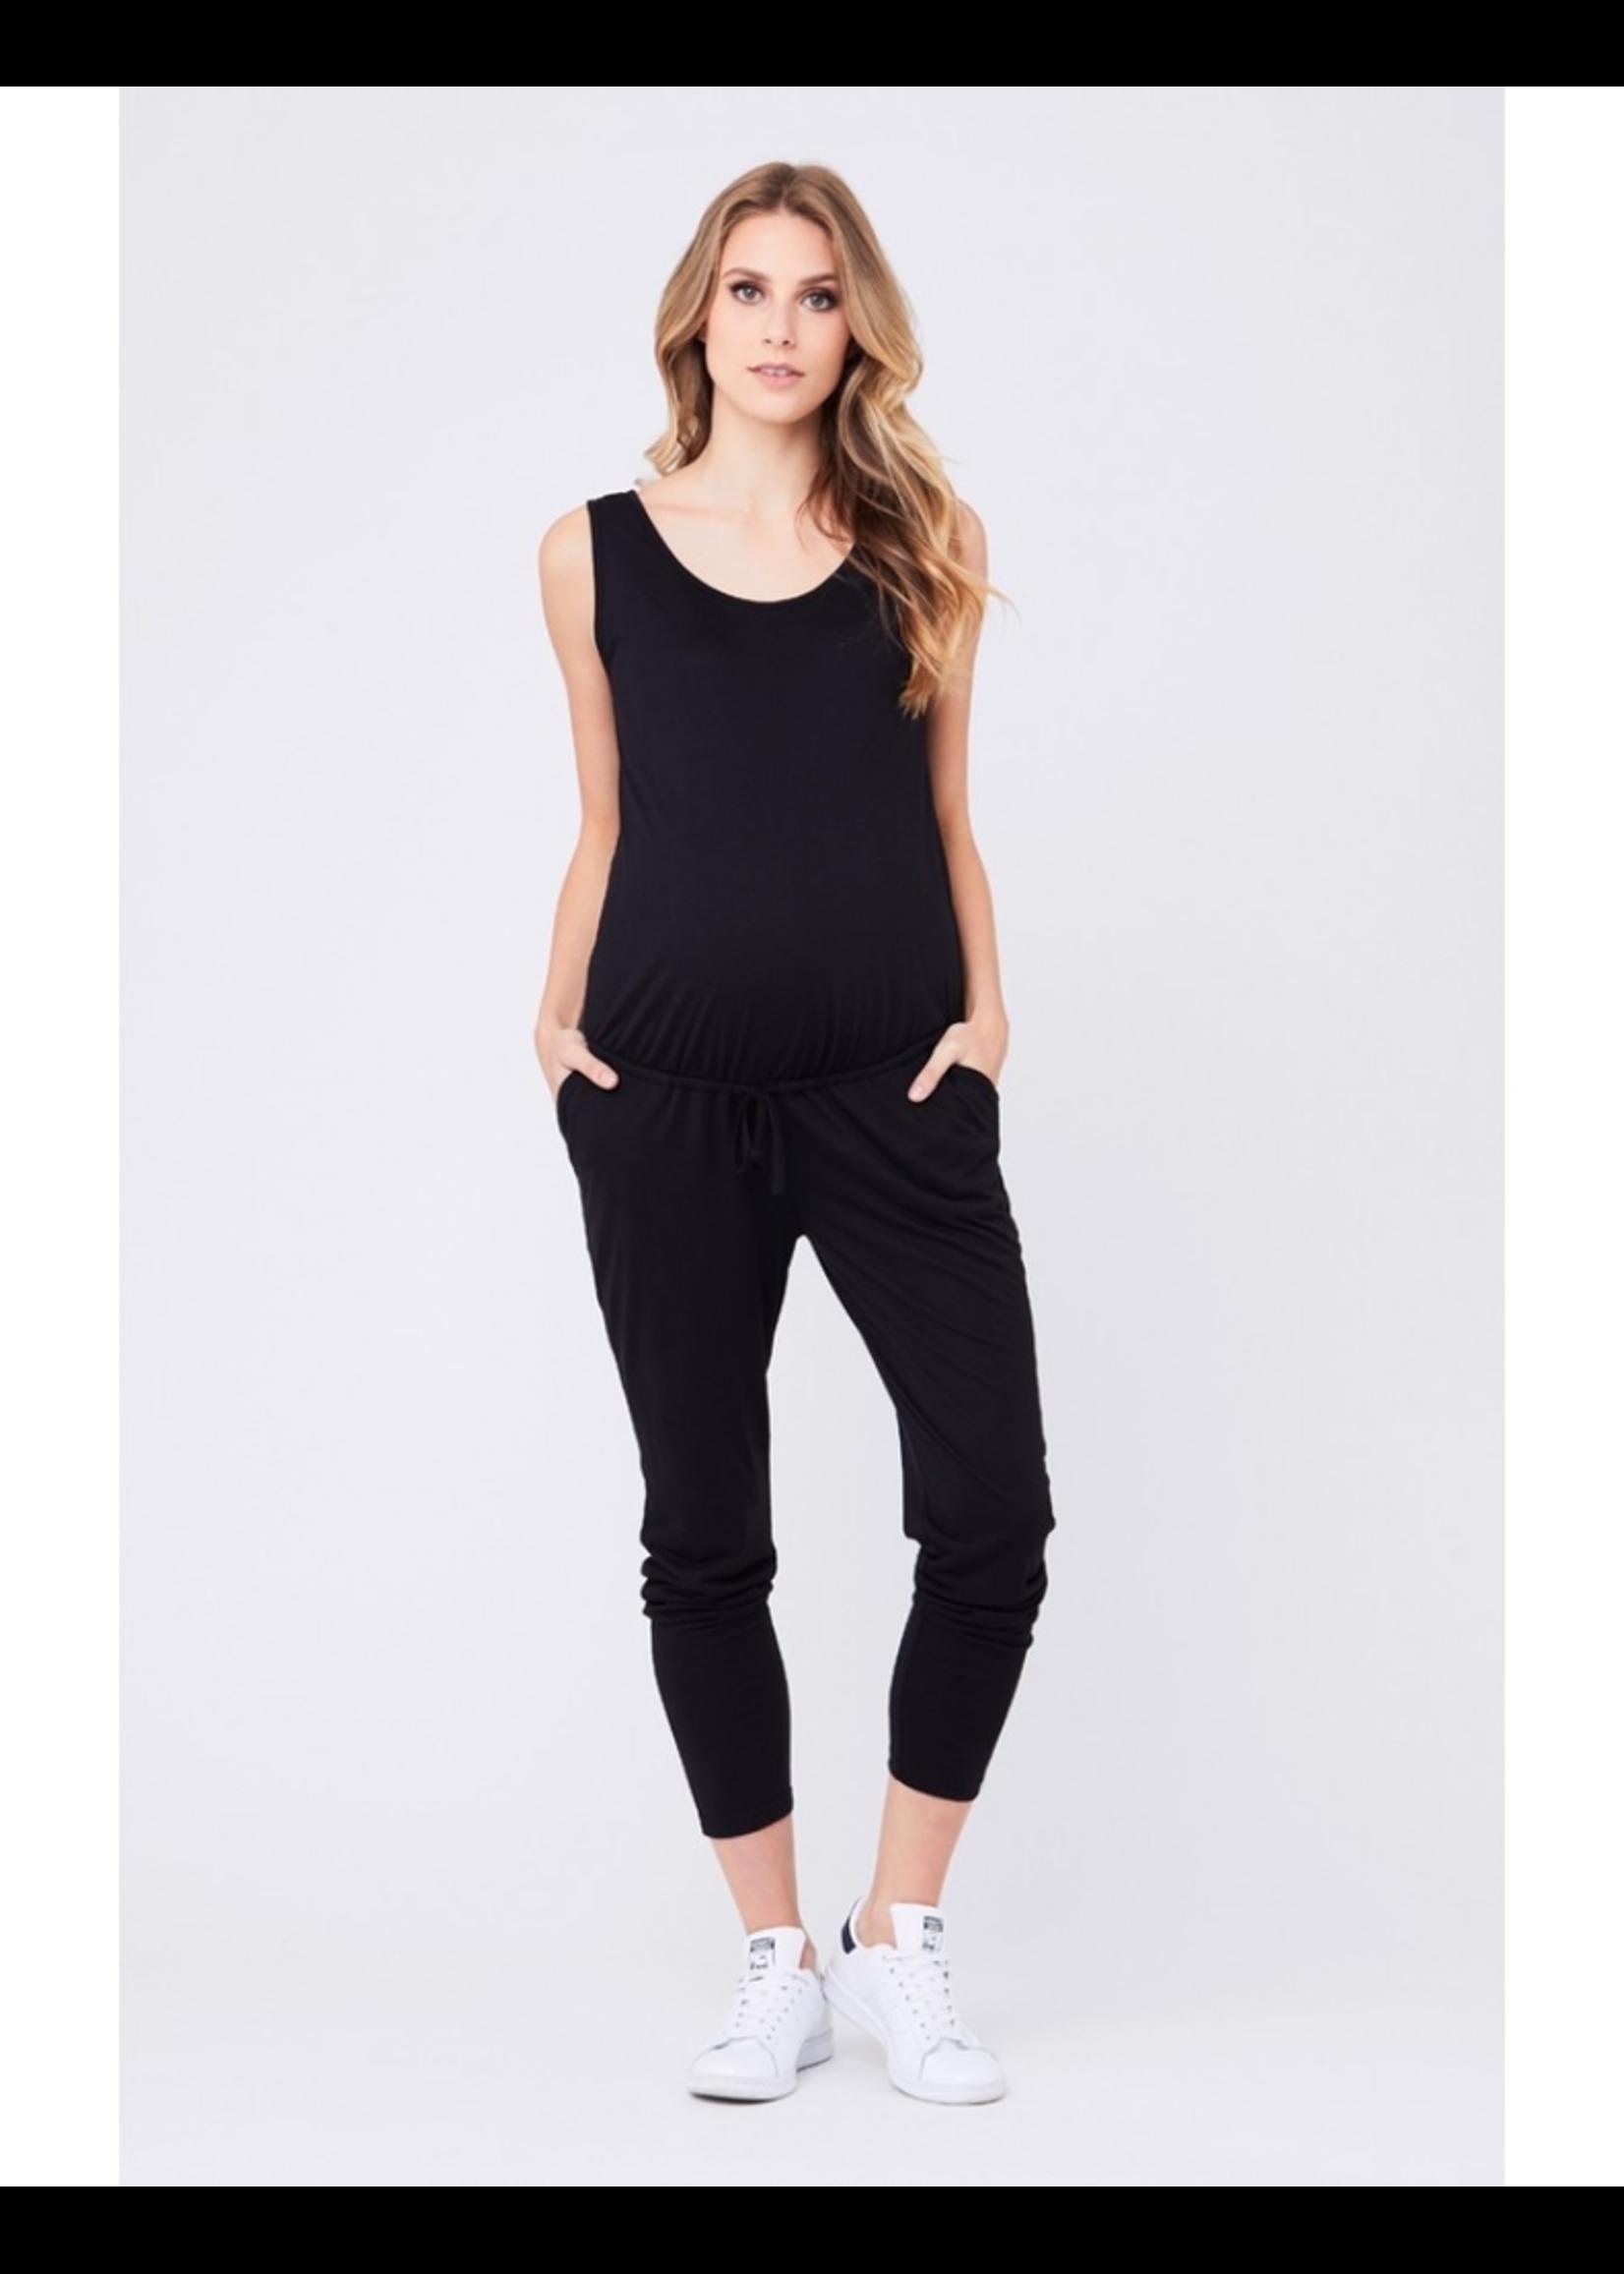 Ripe Maternity RIpe Maternity, Jersey Jumpsuit